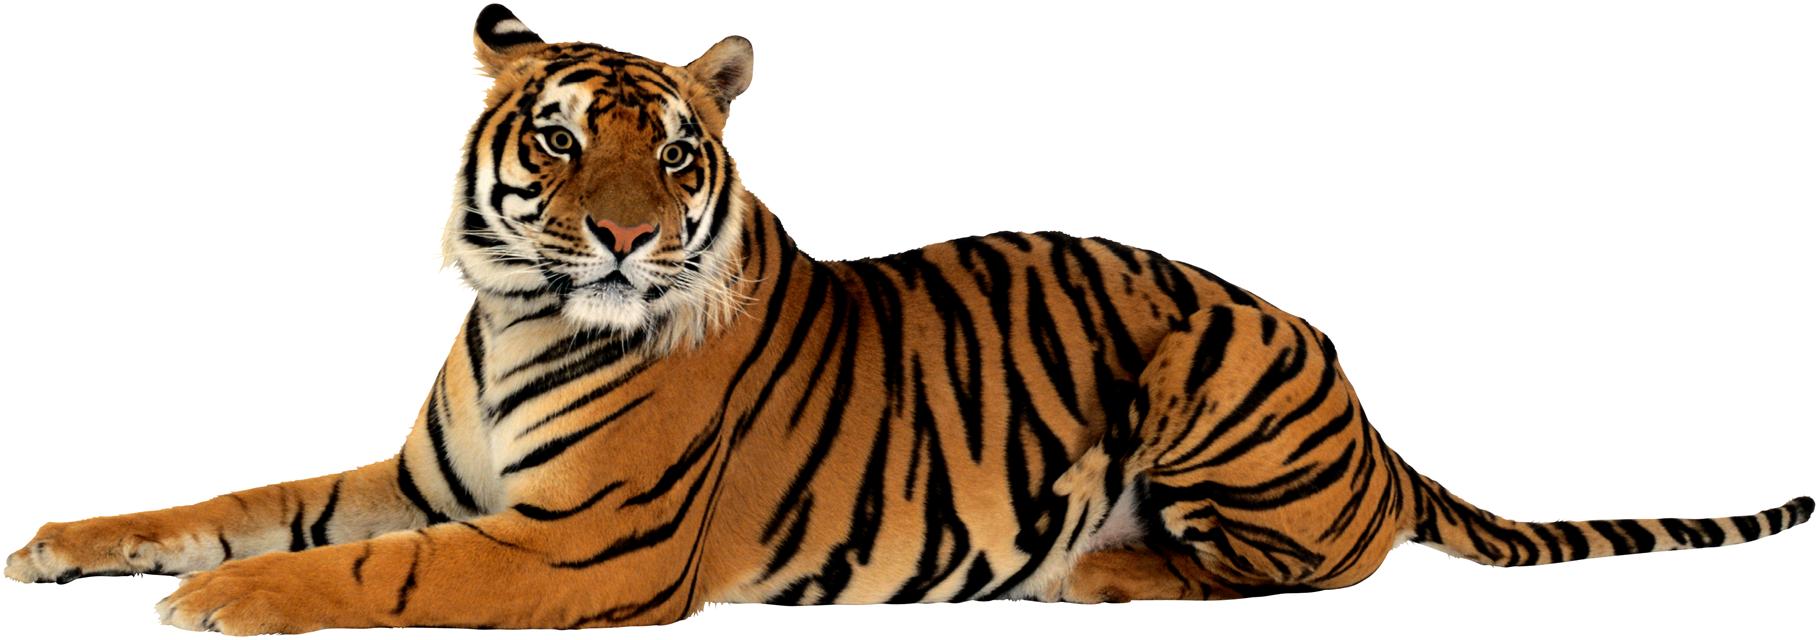 Tiger PNG HD Quality - Tiger HD PNG